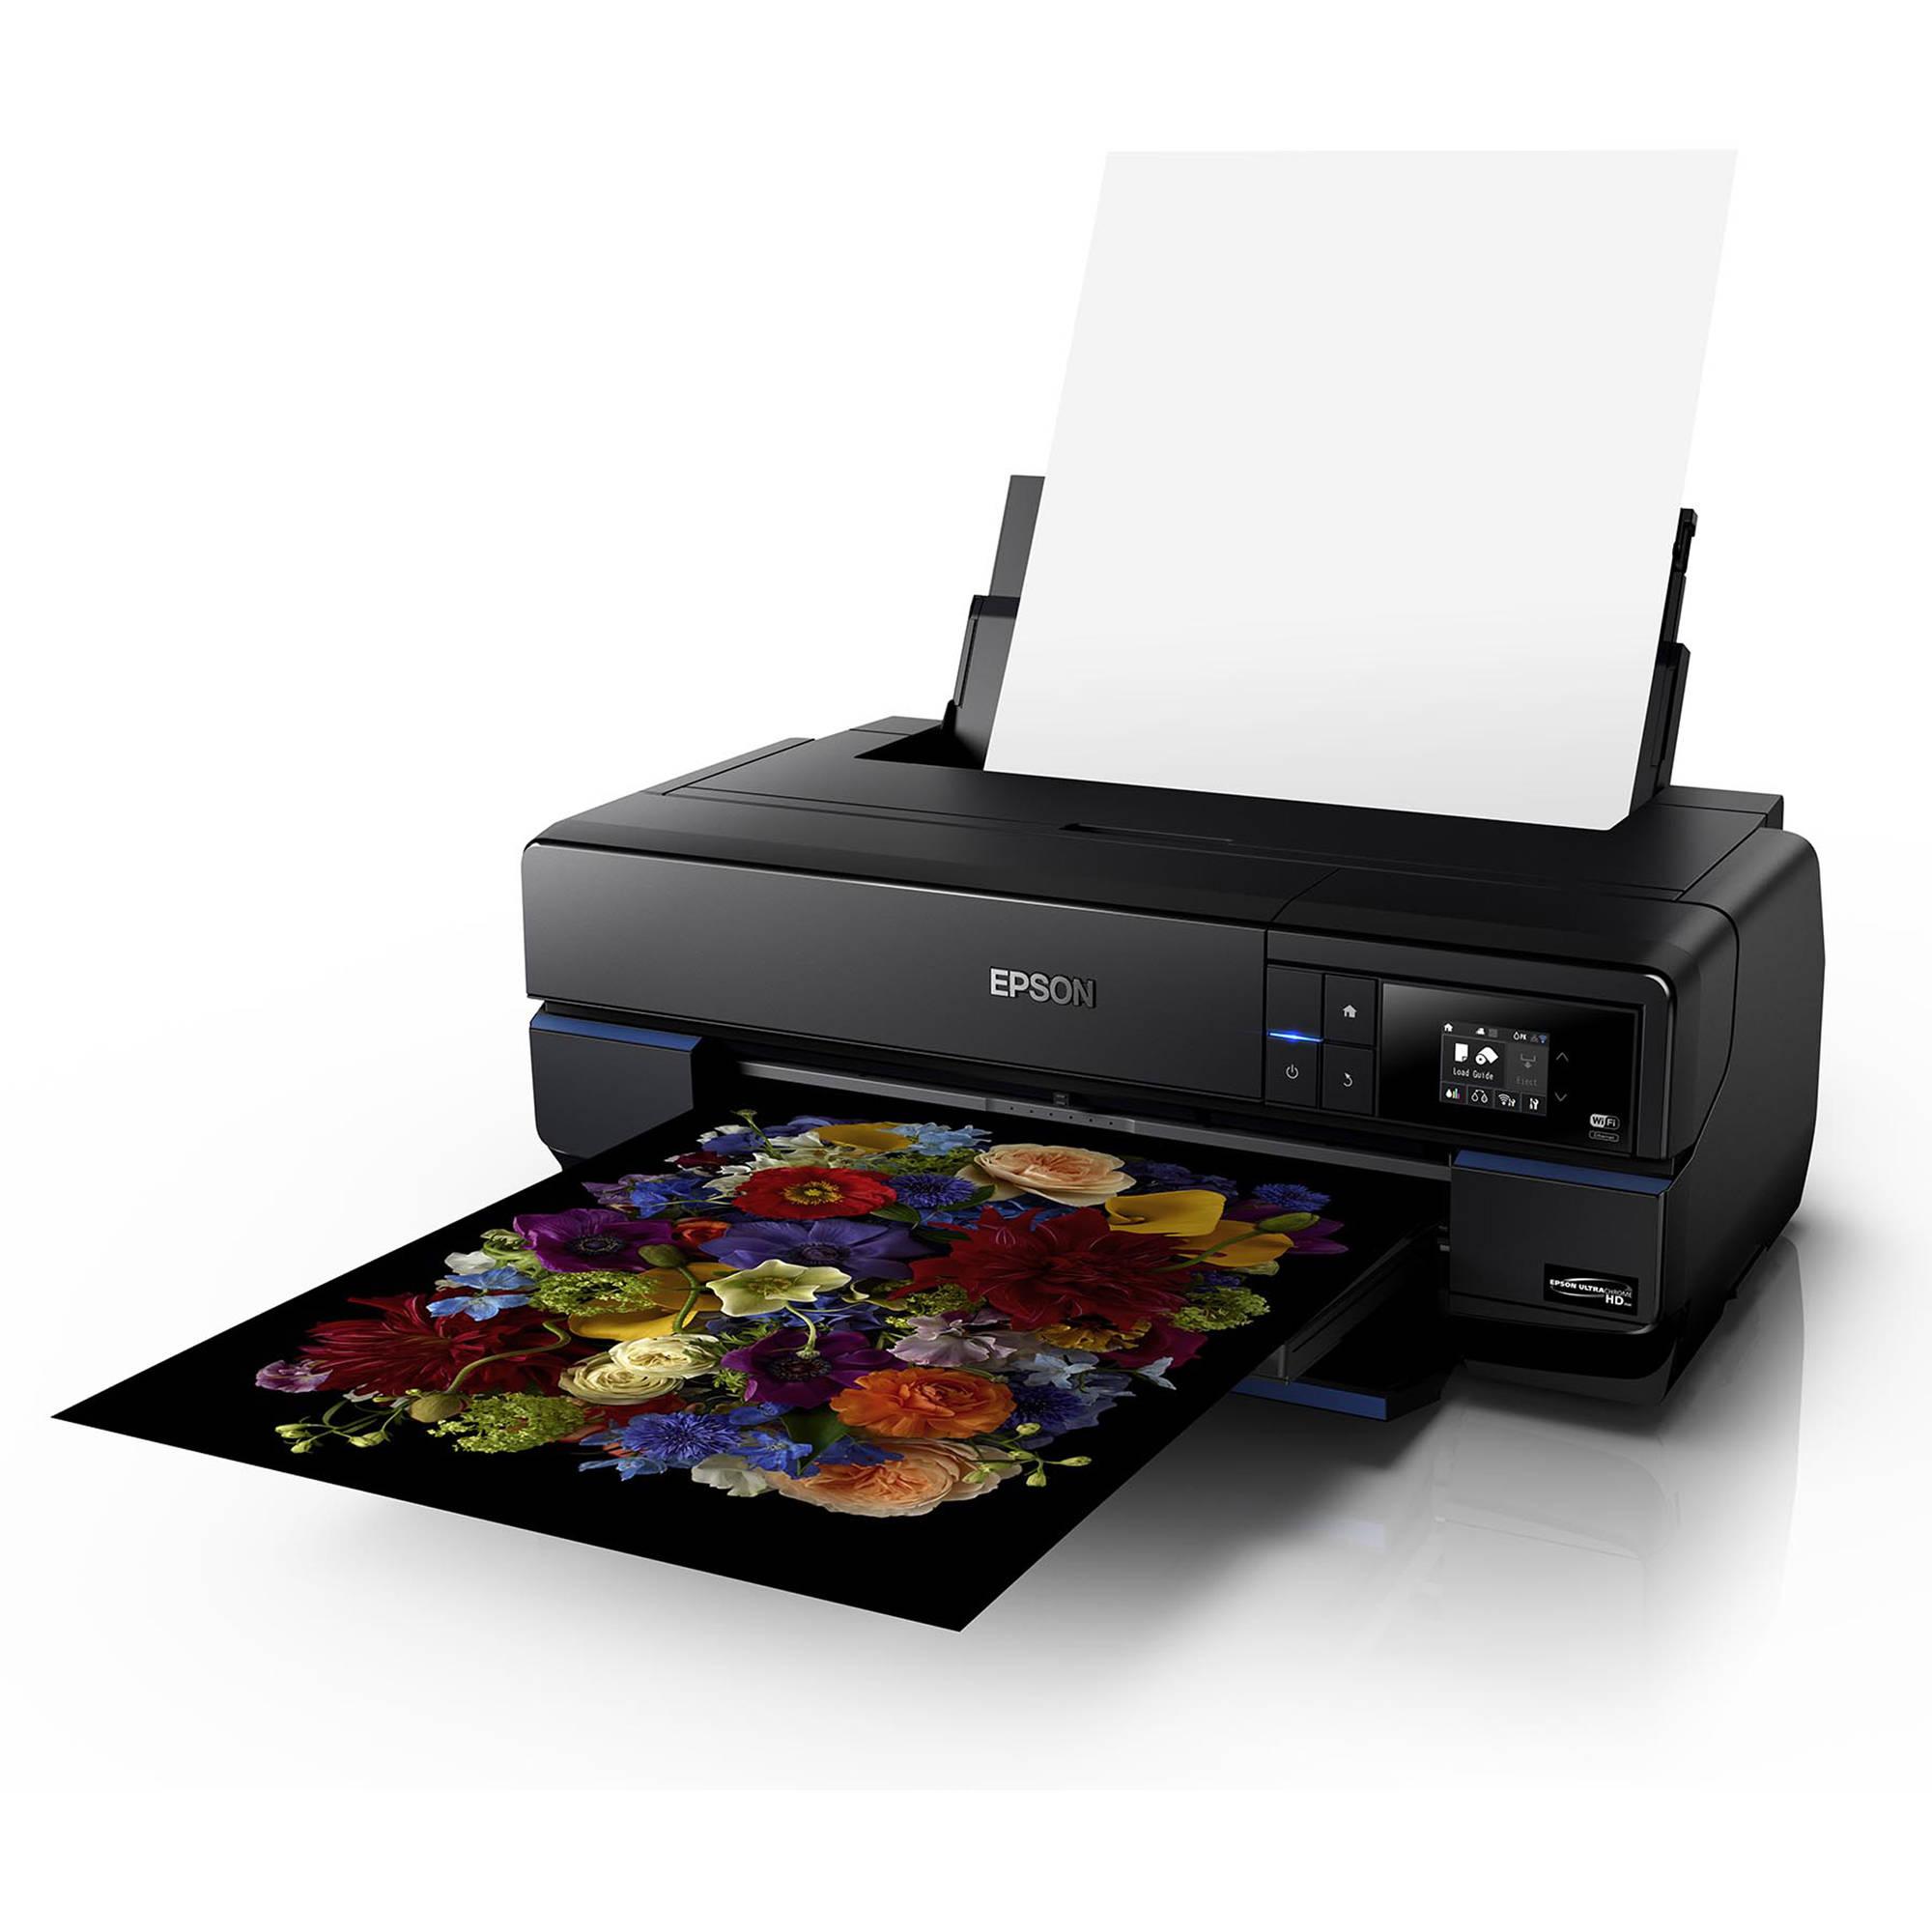 Epson SureColor P800 Designer Edition Inkjet Printer